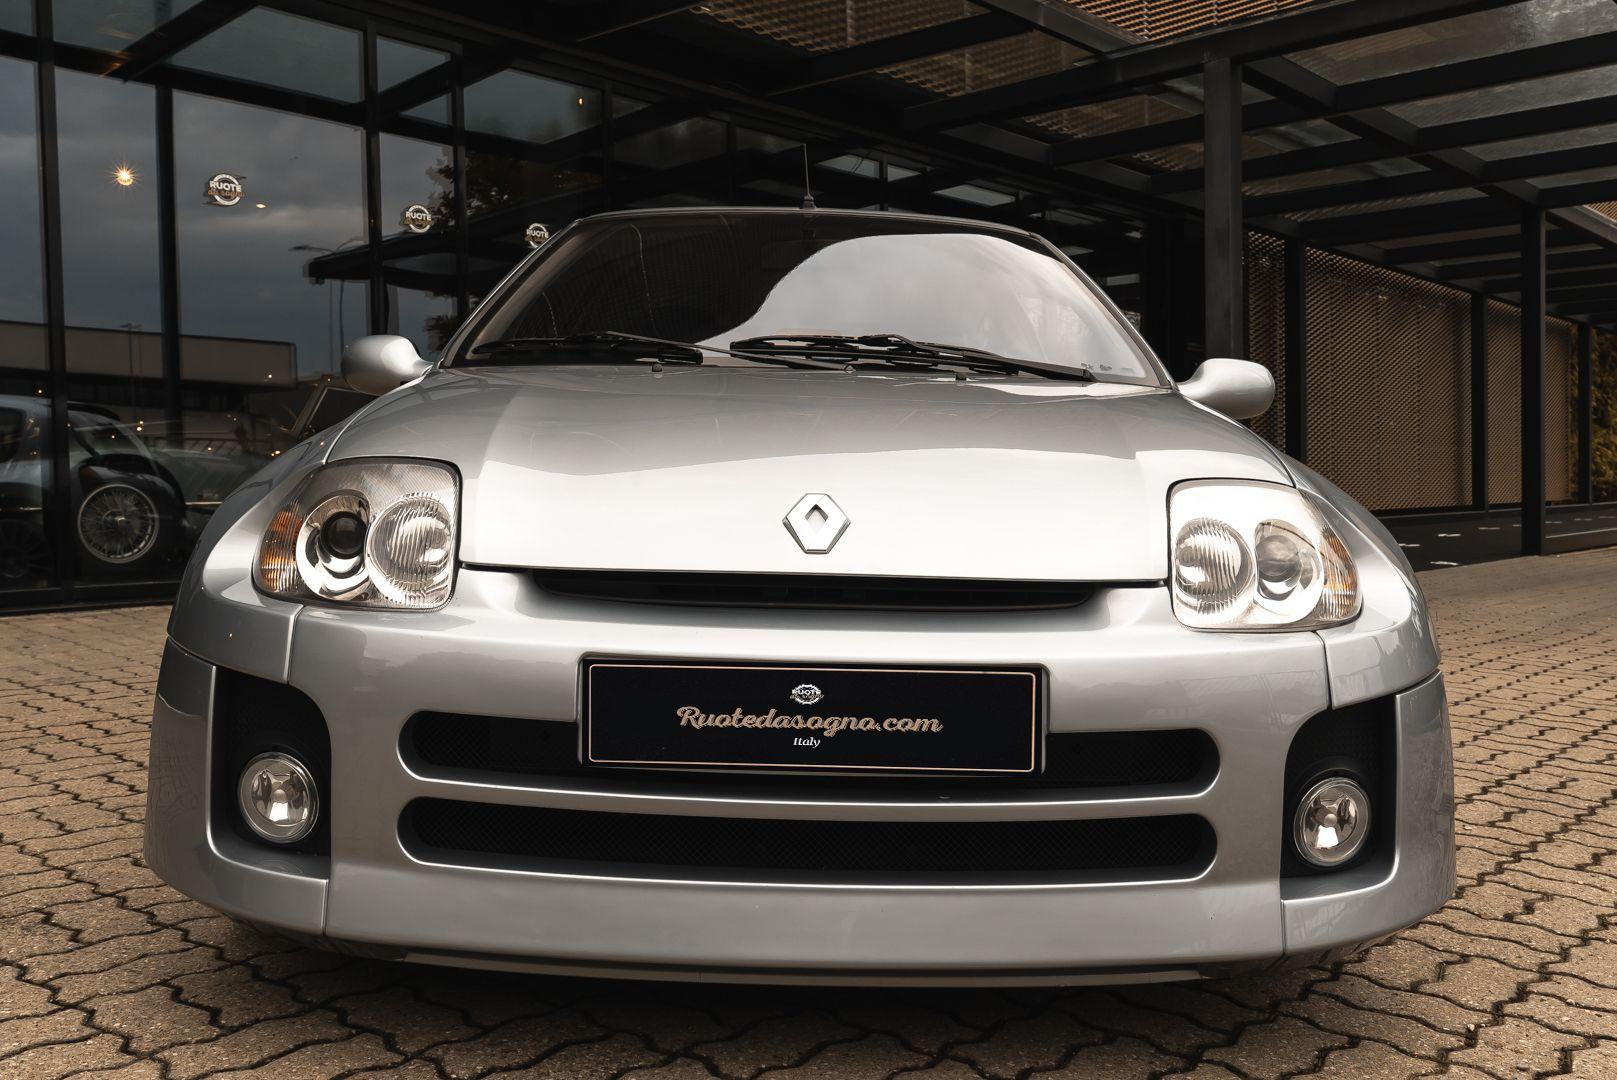 2002 Renault Clio 3.0 V6 Renault Sport Phase1 84919